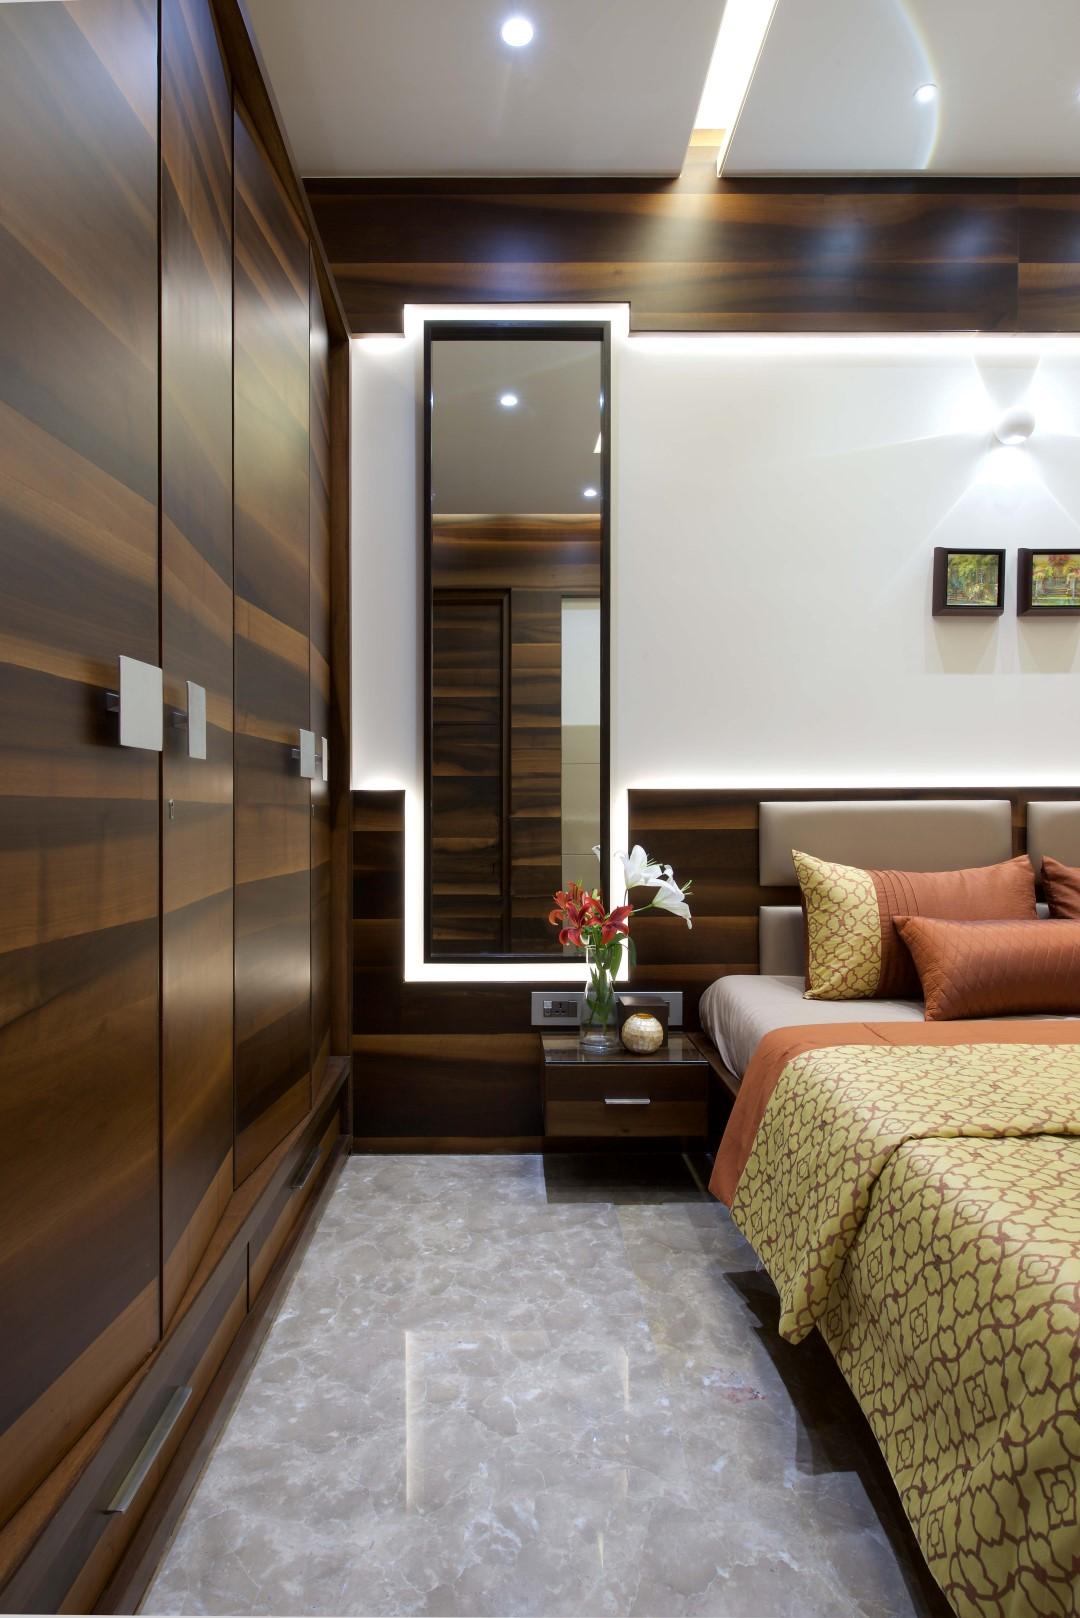 Interior Design Ideas For Large Living Room: 3 BHK Apartment Interiors At Yari Road